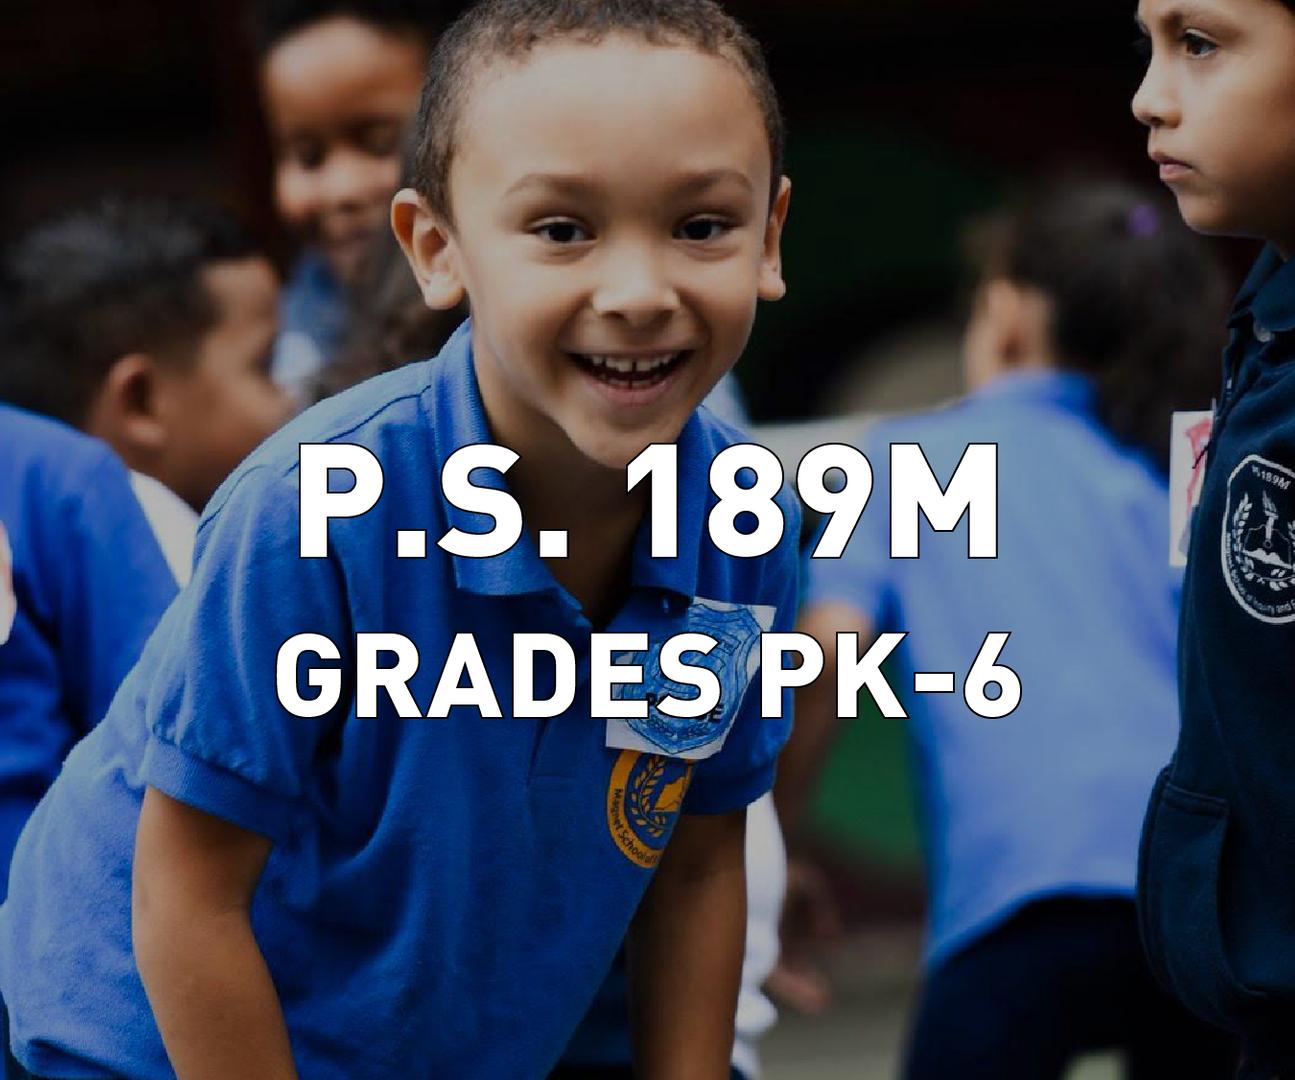 P.S. 189M Grades PK-6